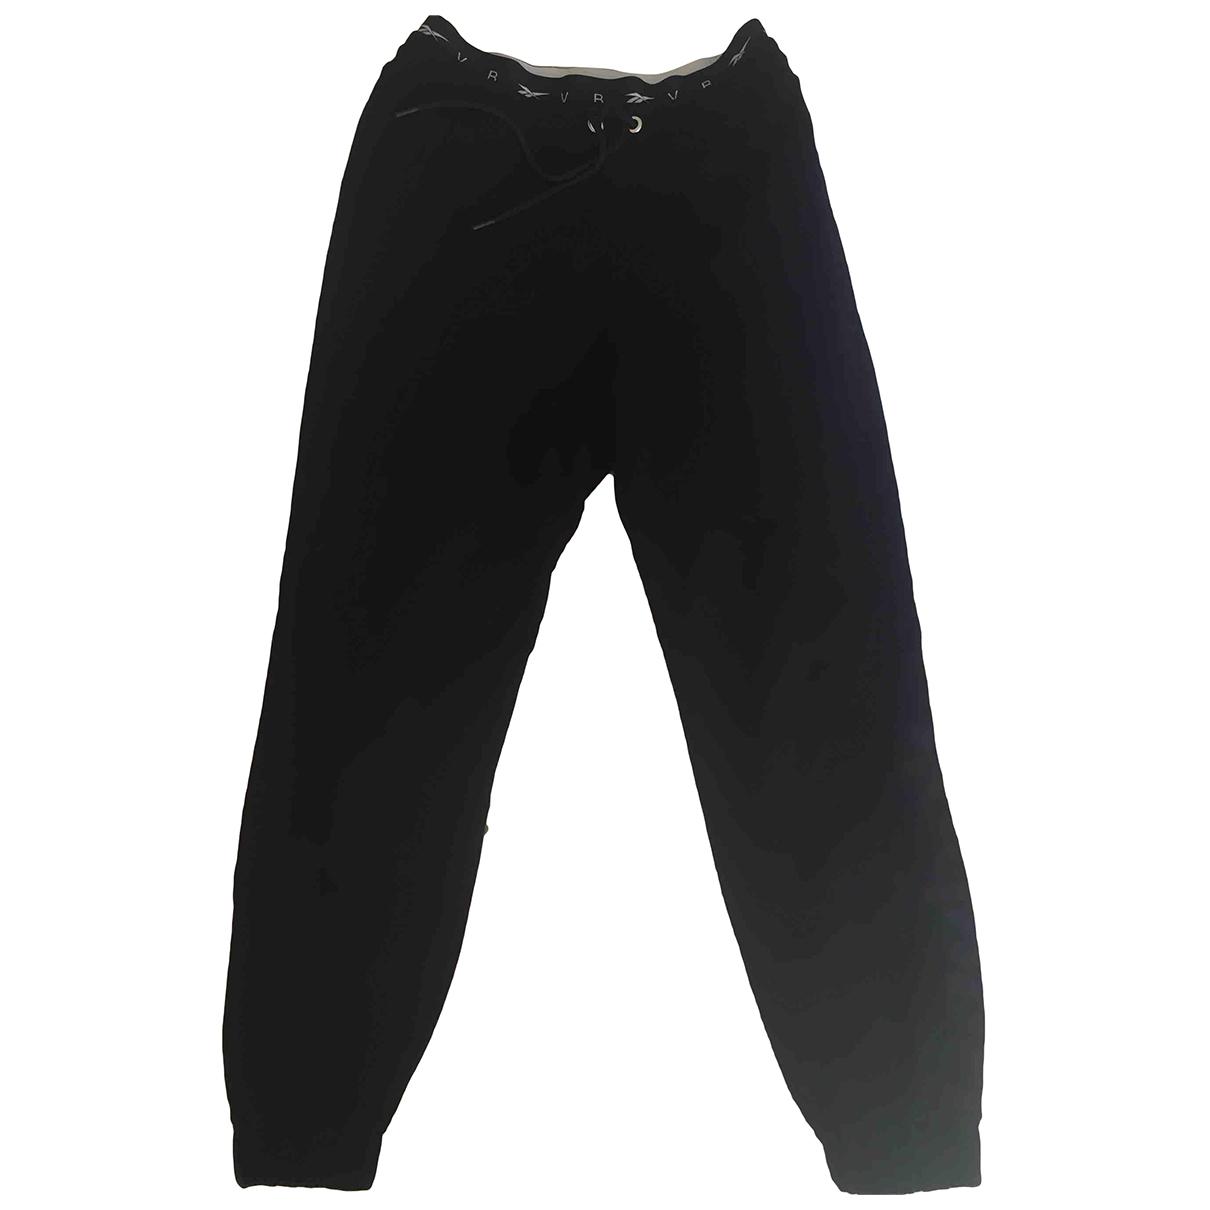 Reebok \N Black Cotton Trousers for Women S International